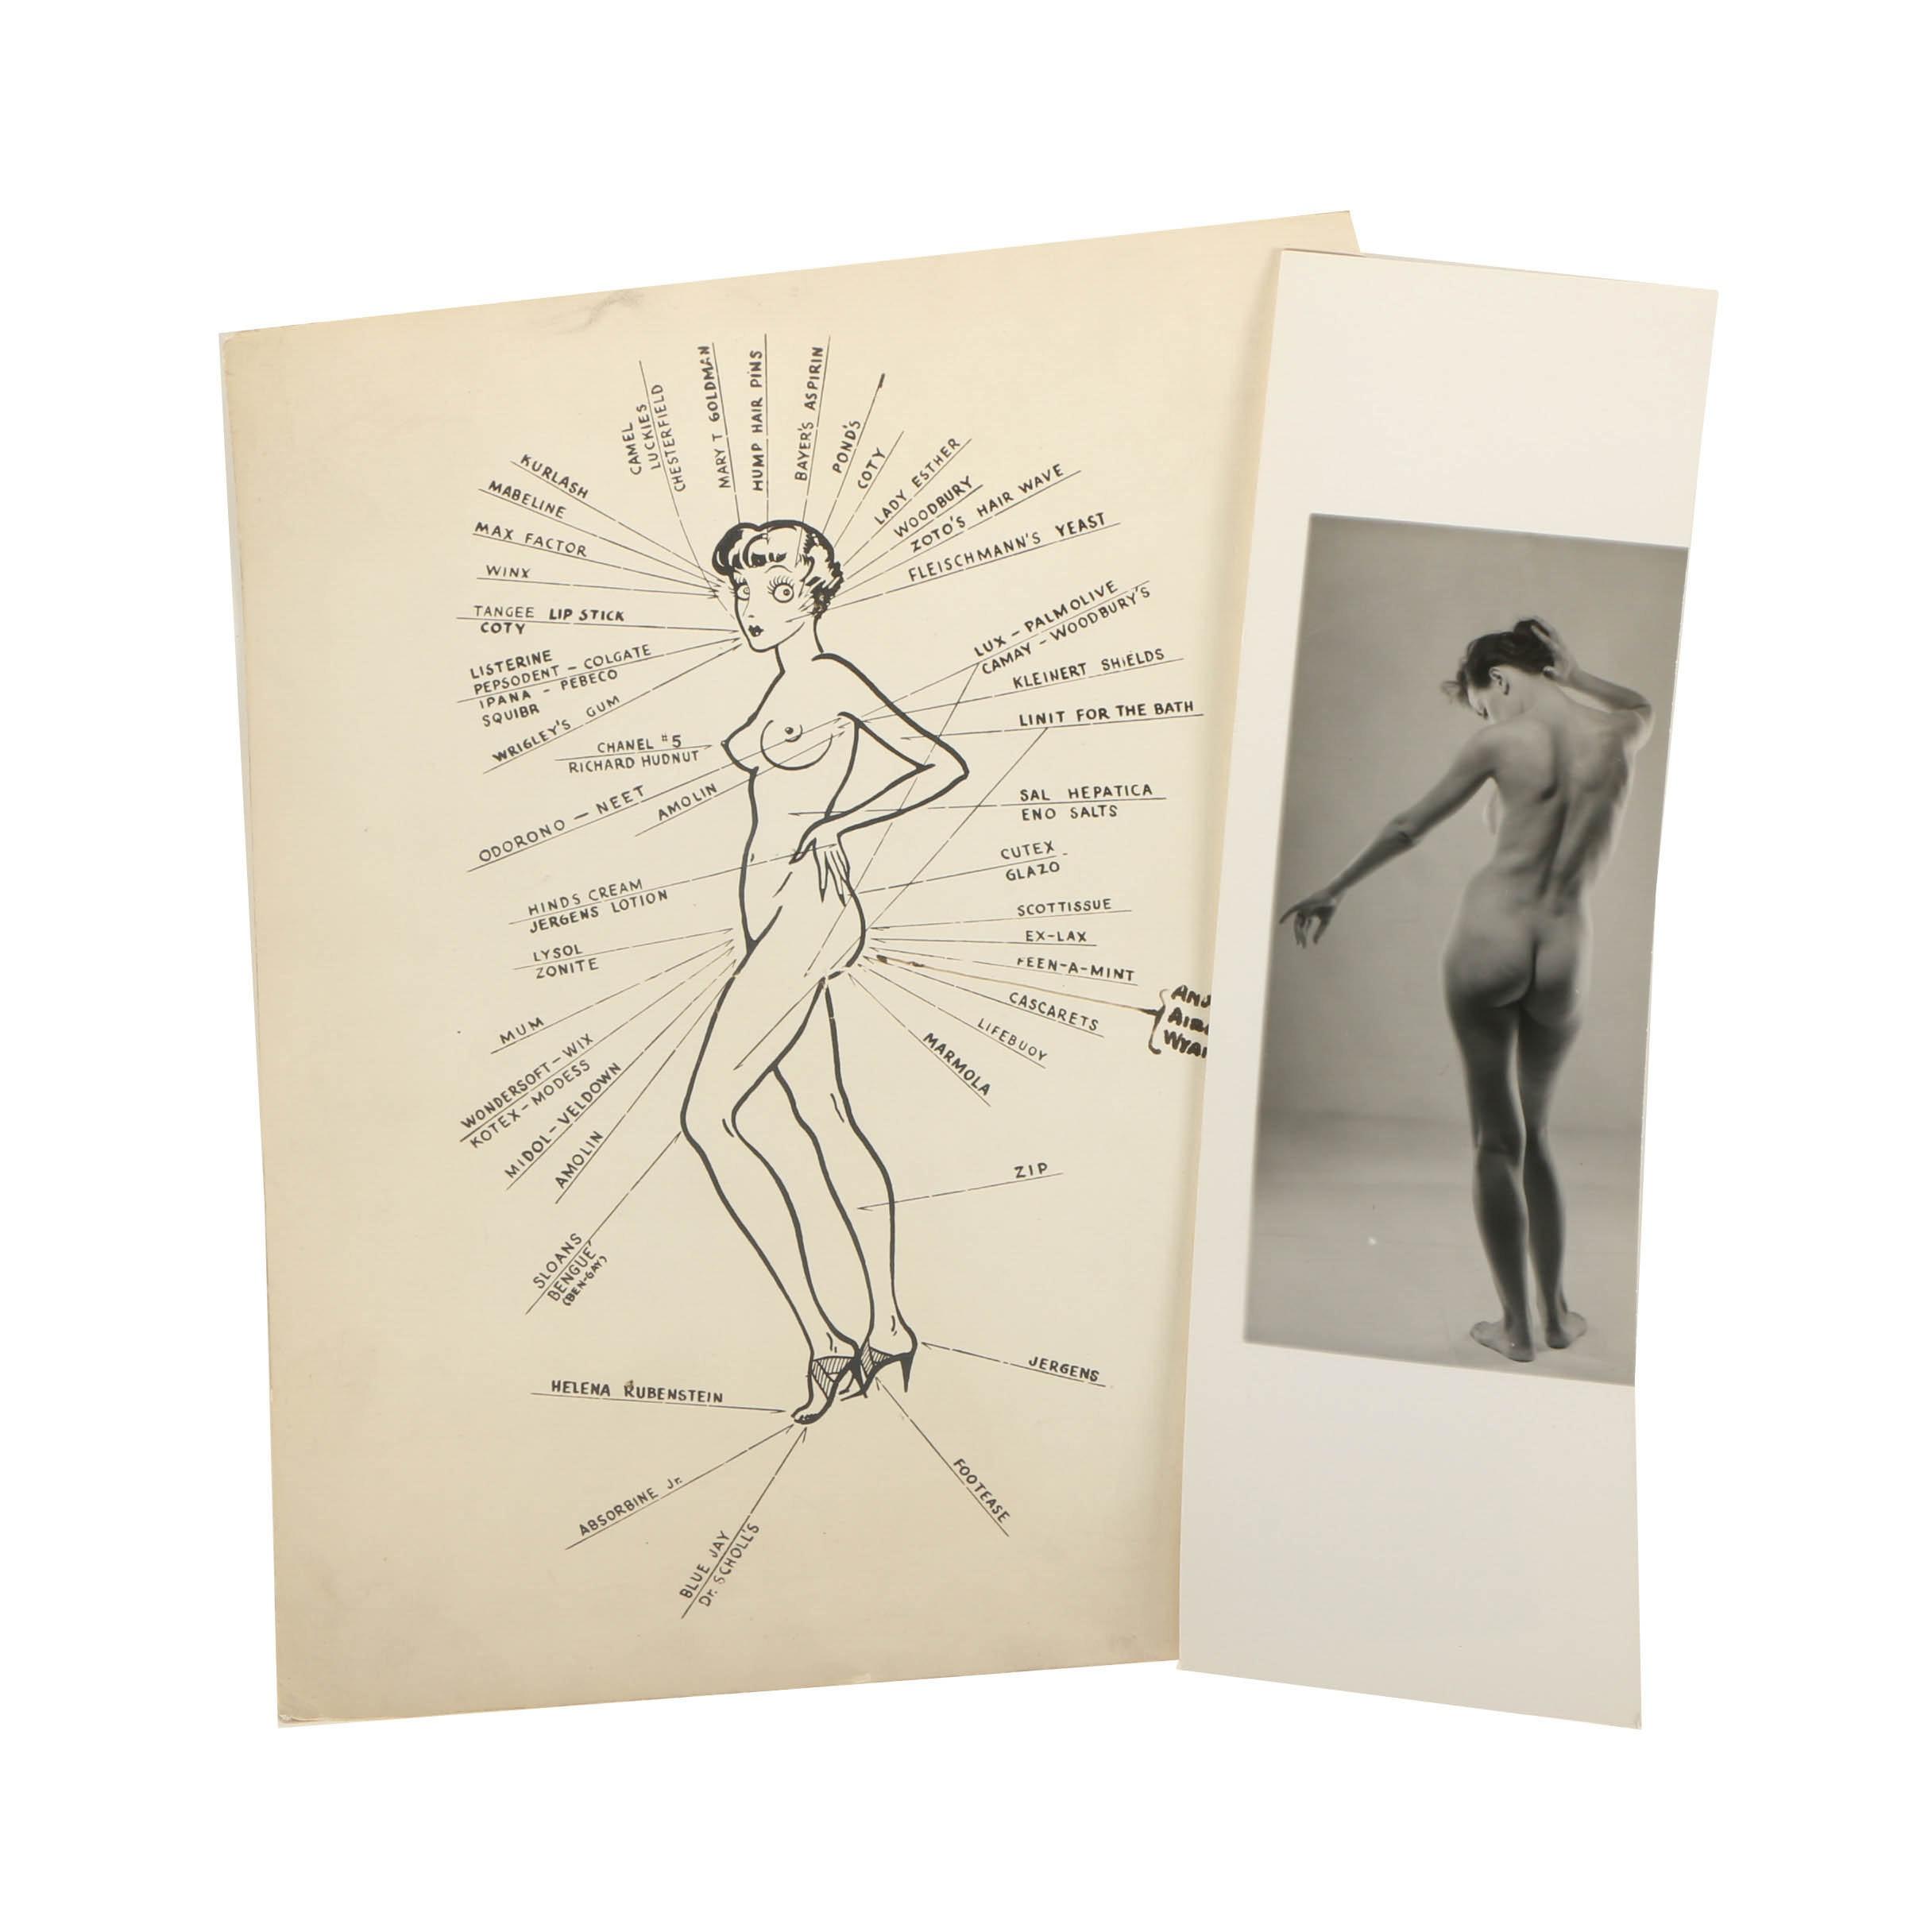 Mid 20th Century Silver Gelatin Photographs